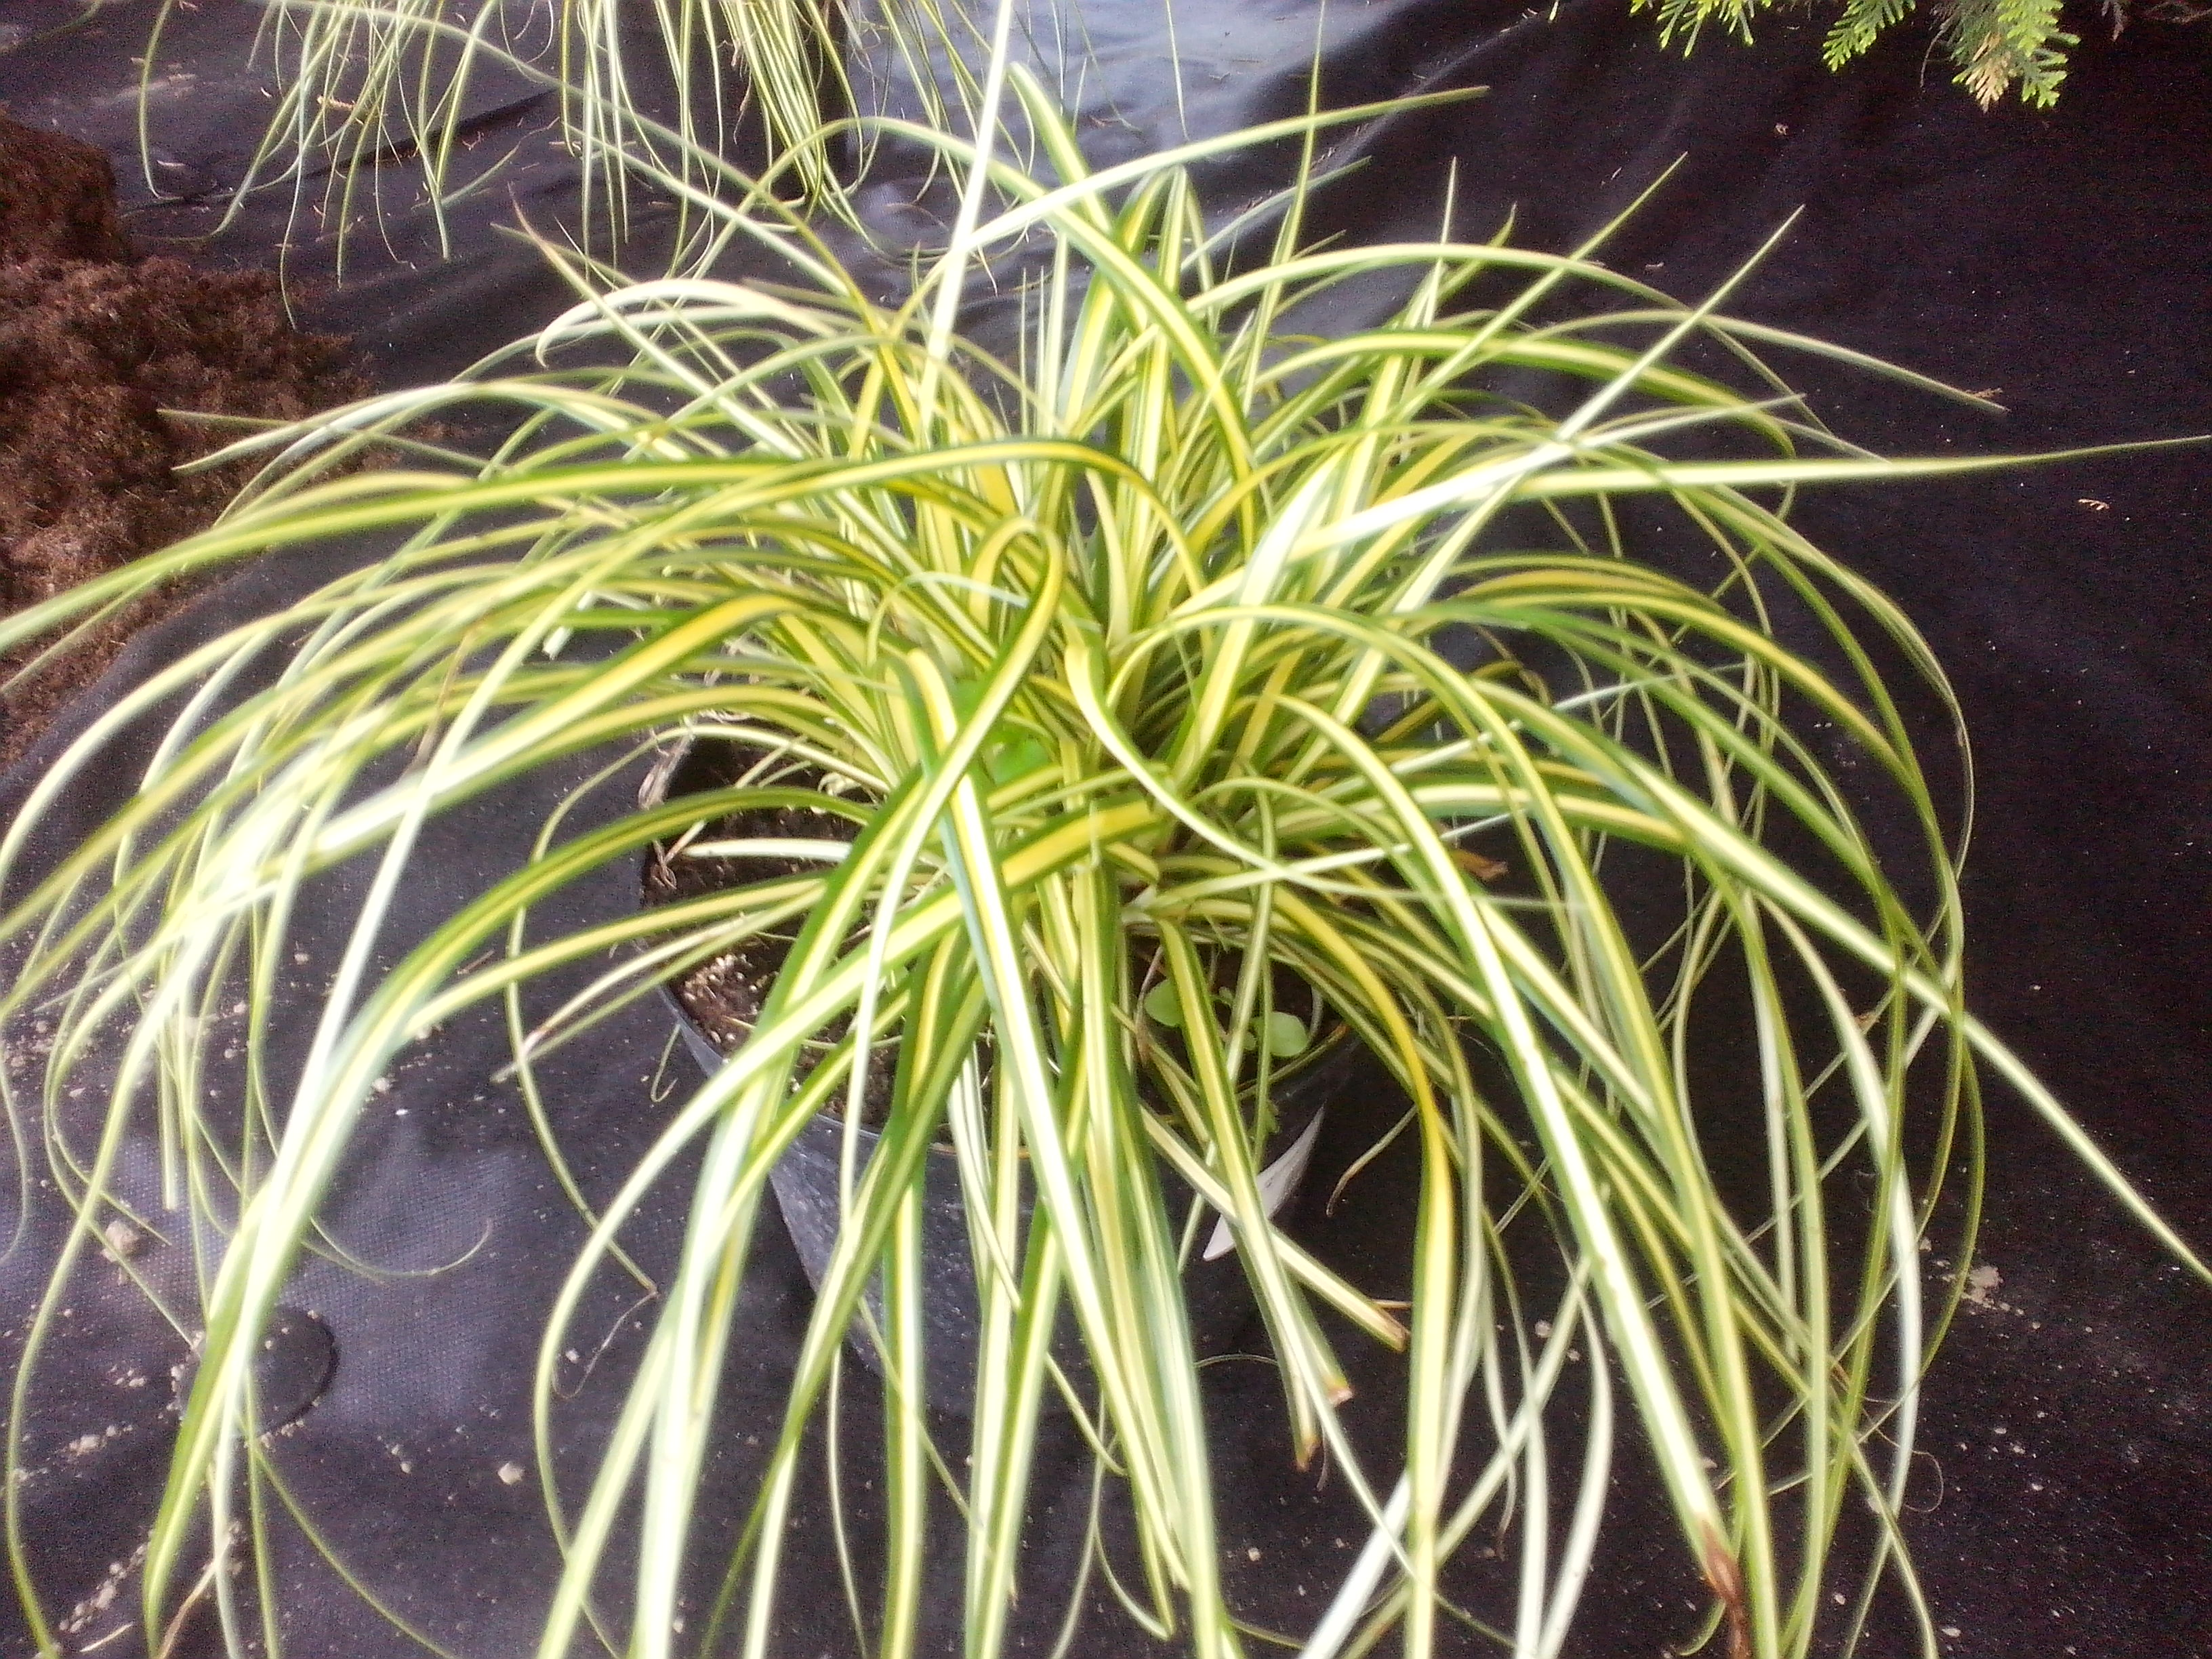 Japan-Gold-Segge (Carex oshimensis) 'Evergold'